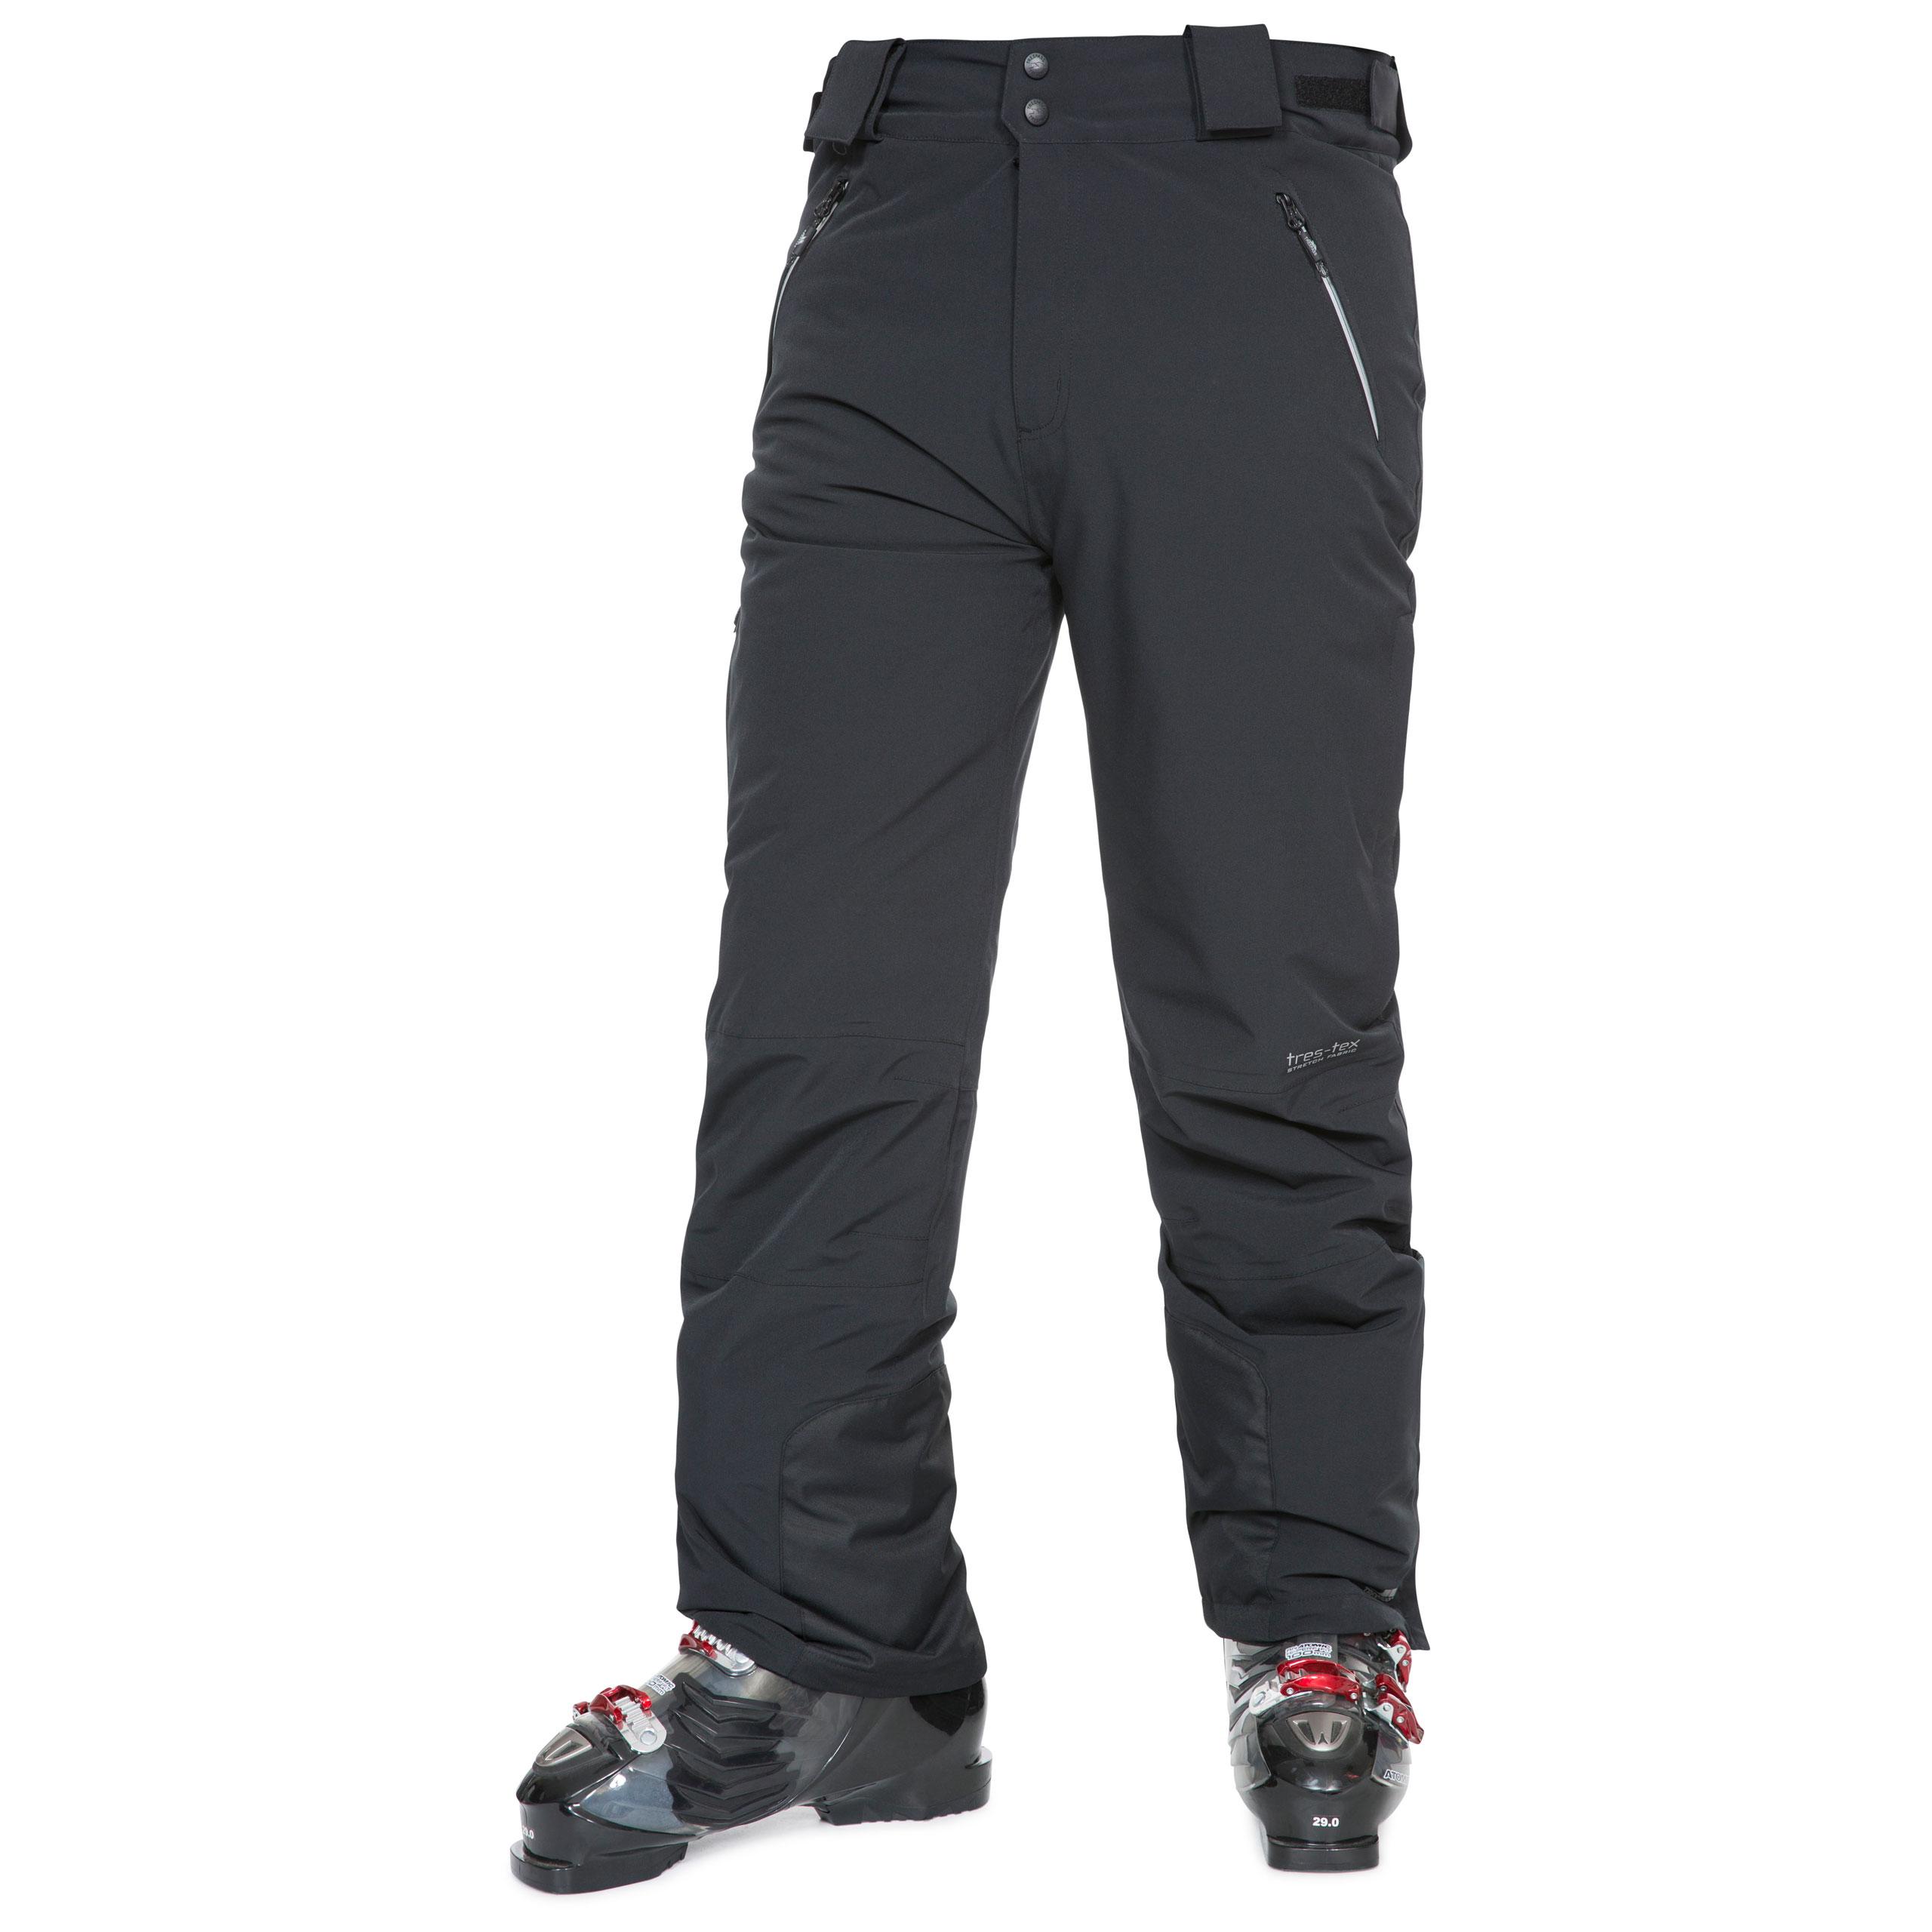 a4d73bef6e Pitstop Mens Ski Pants